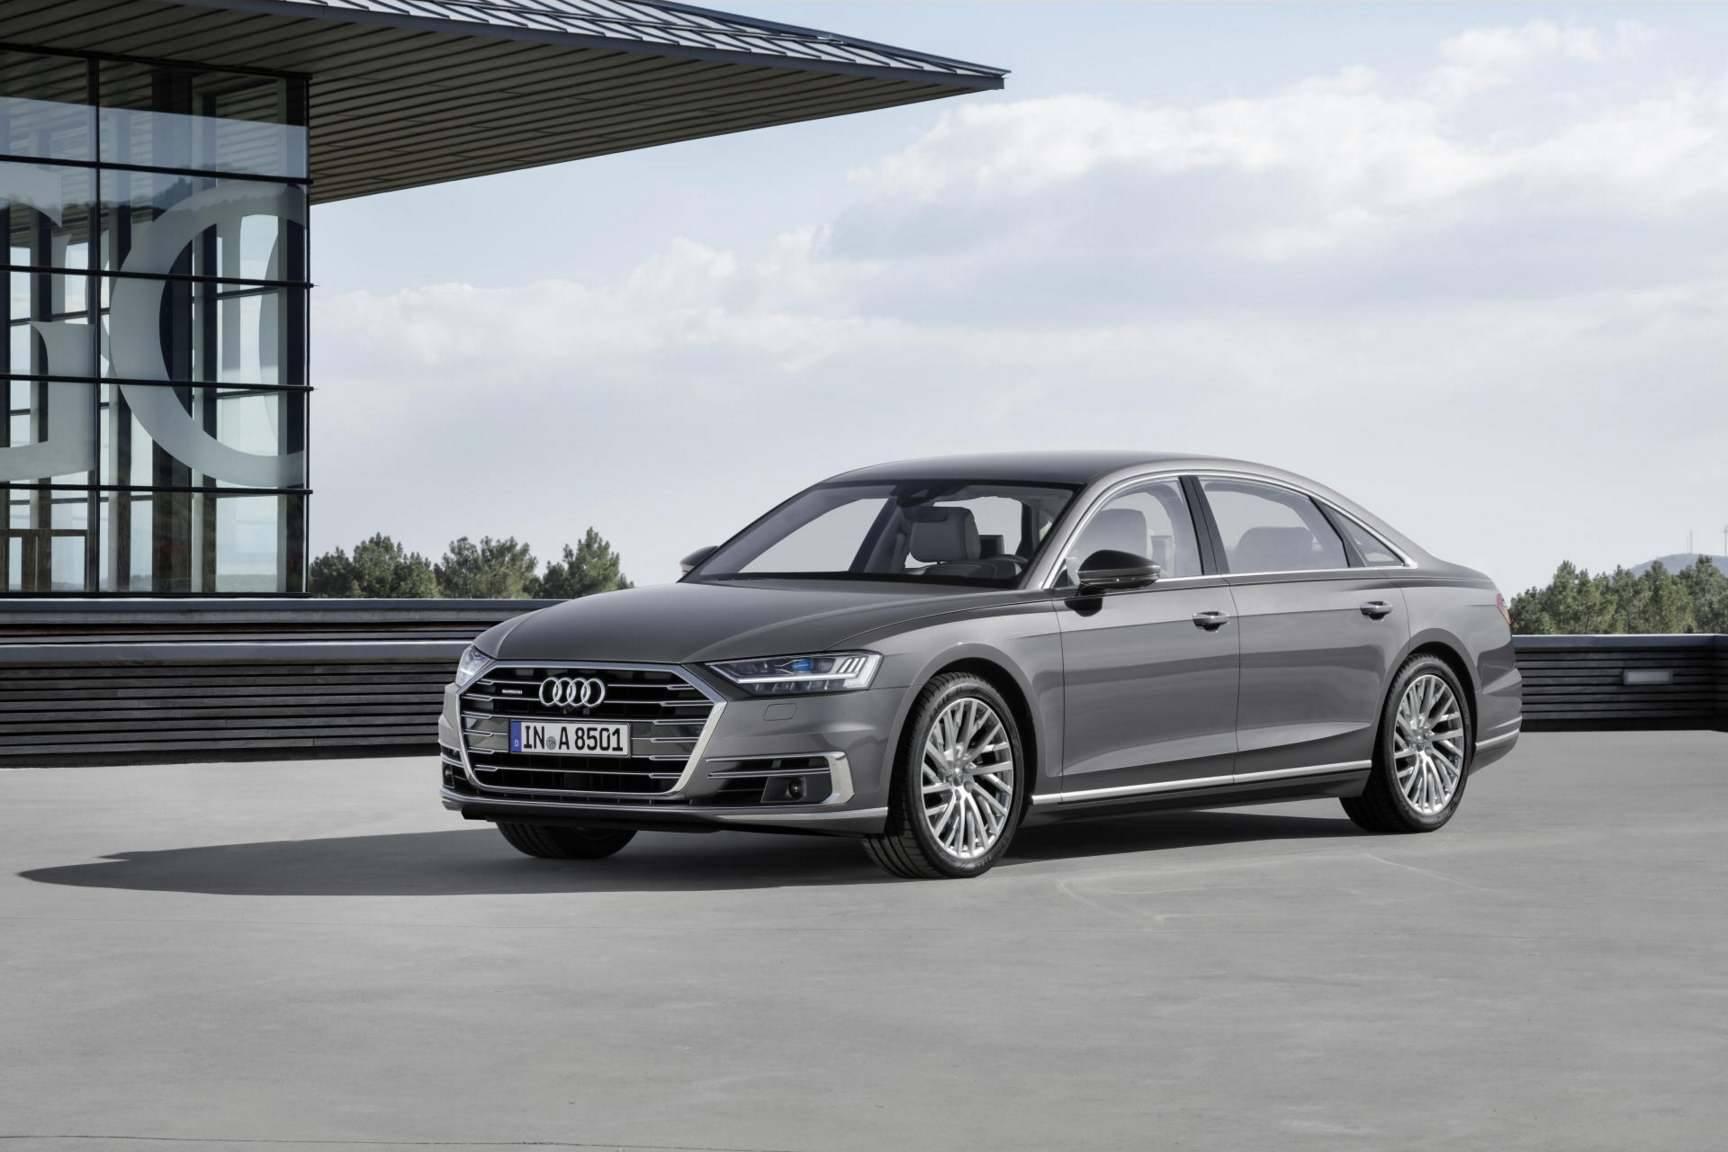 Audi A8 luxury car